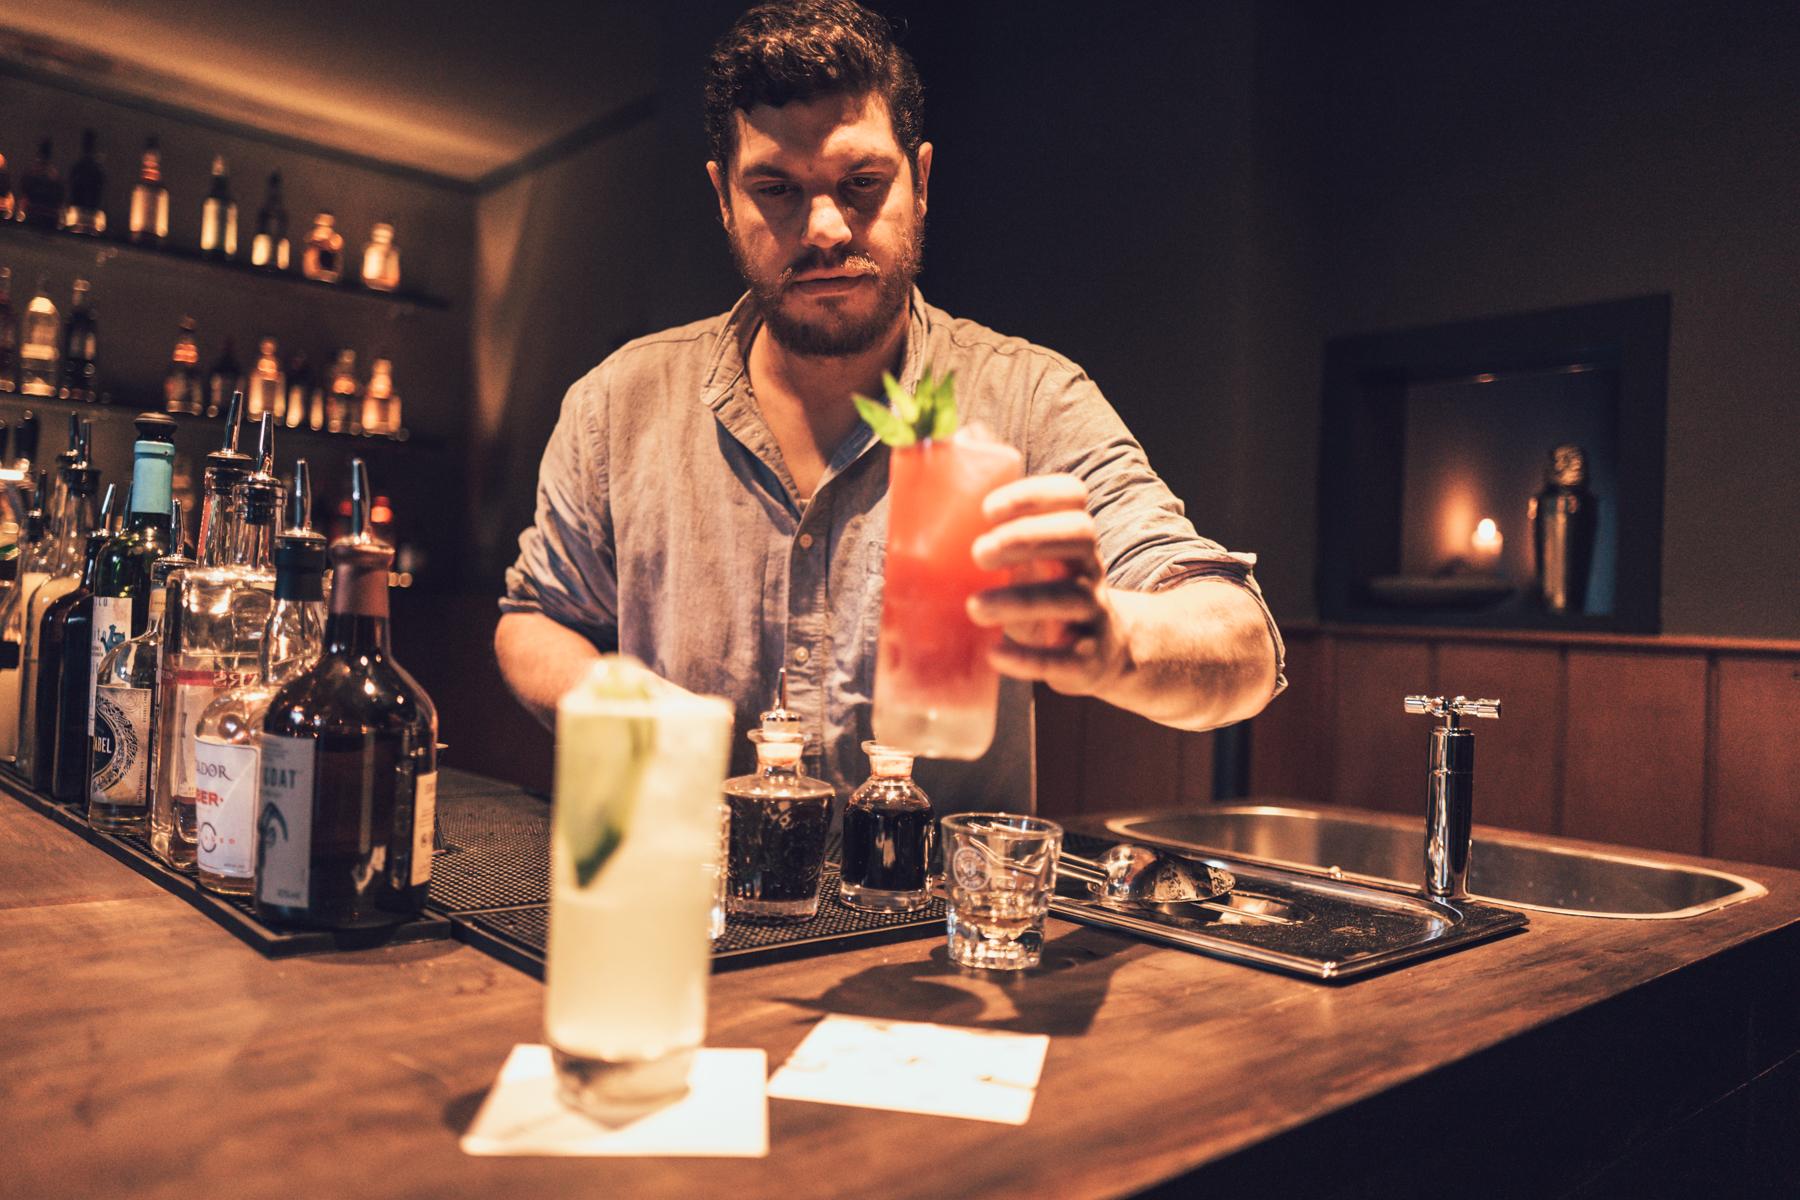 Geheimtipp Hamburg Altona Bar Tiny Oyster Inn Cristina Lopez 1